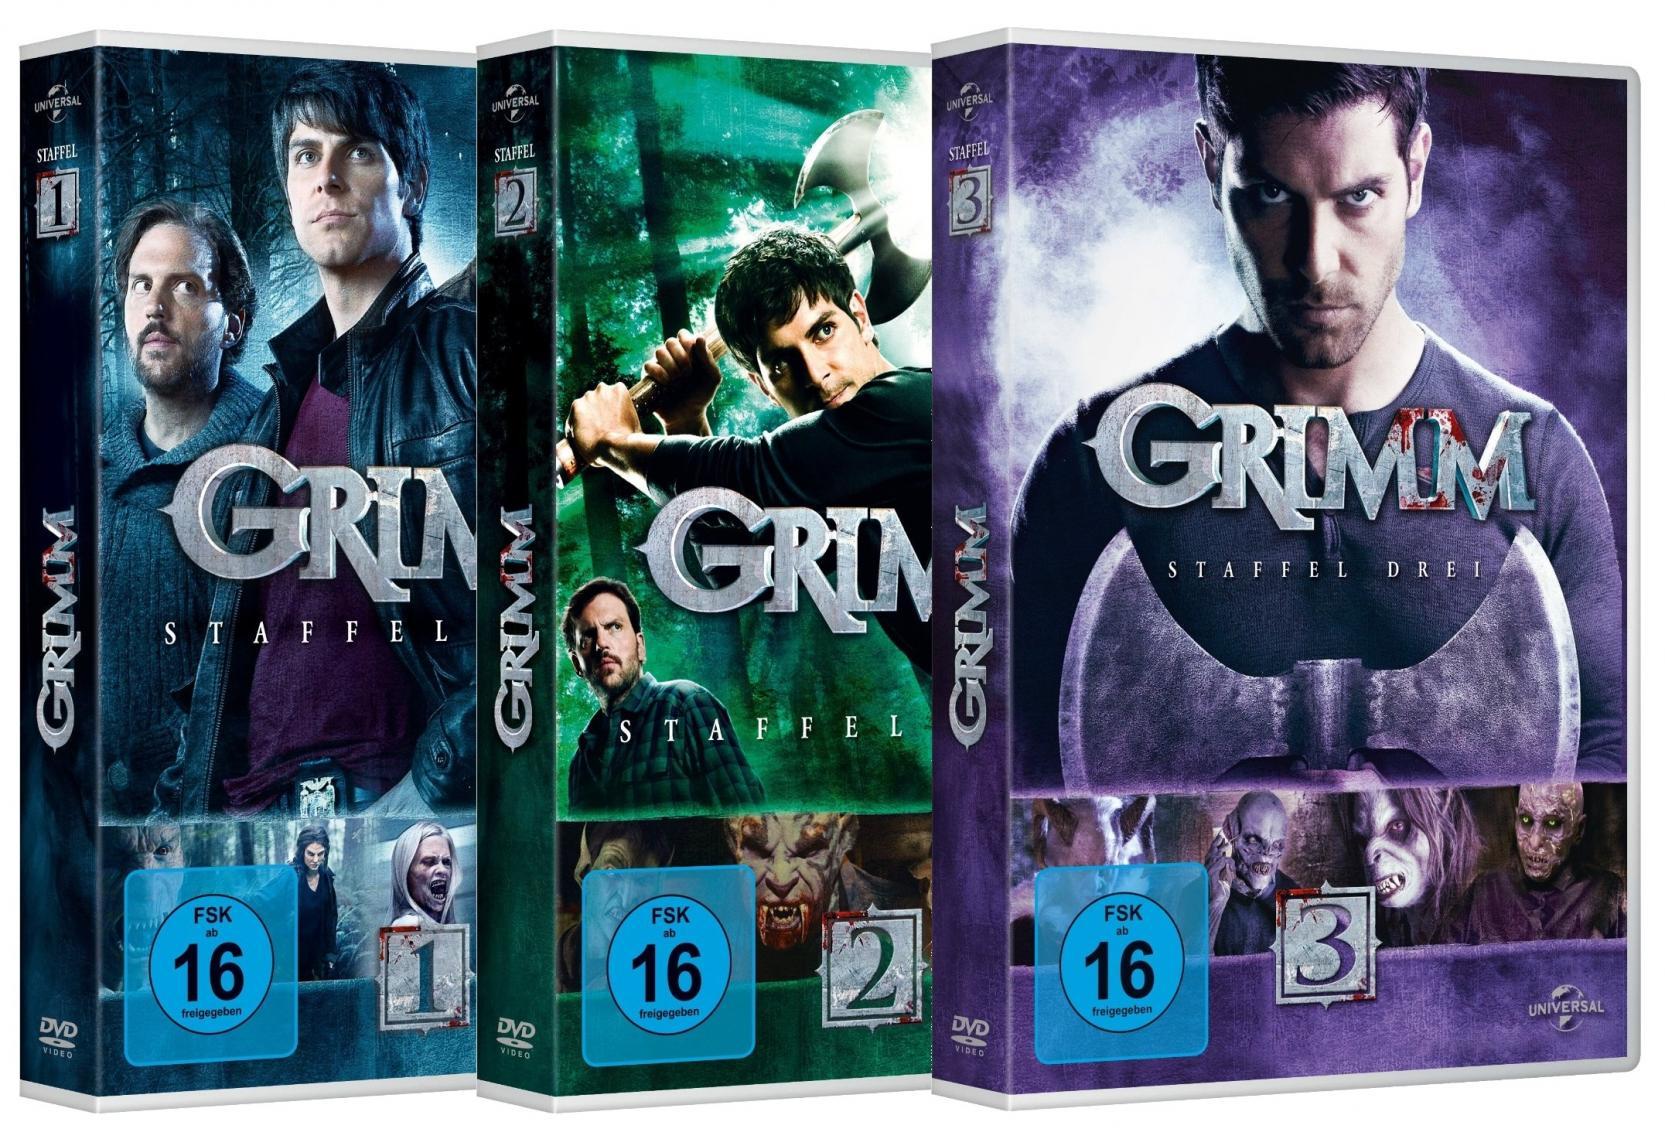 Grimm Staffel 1-3 Set (DVD)